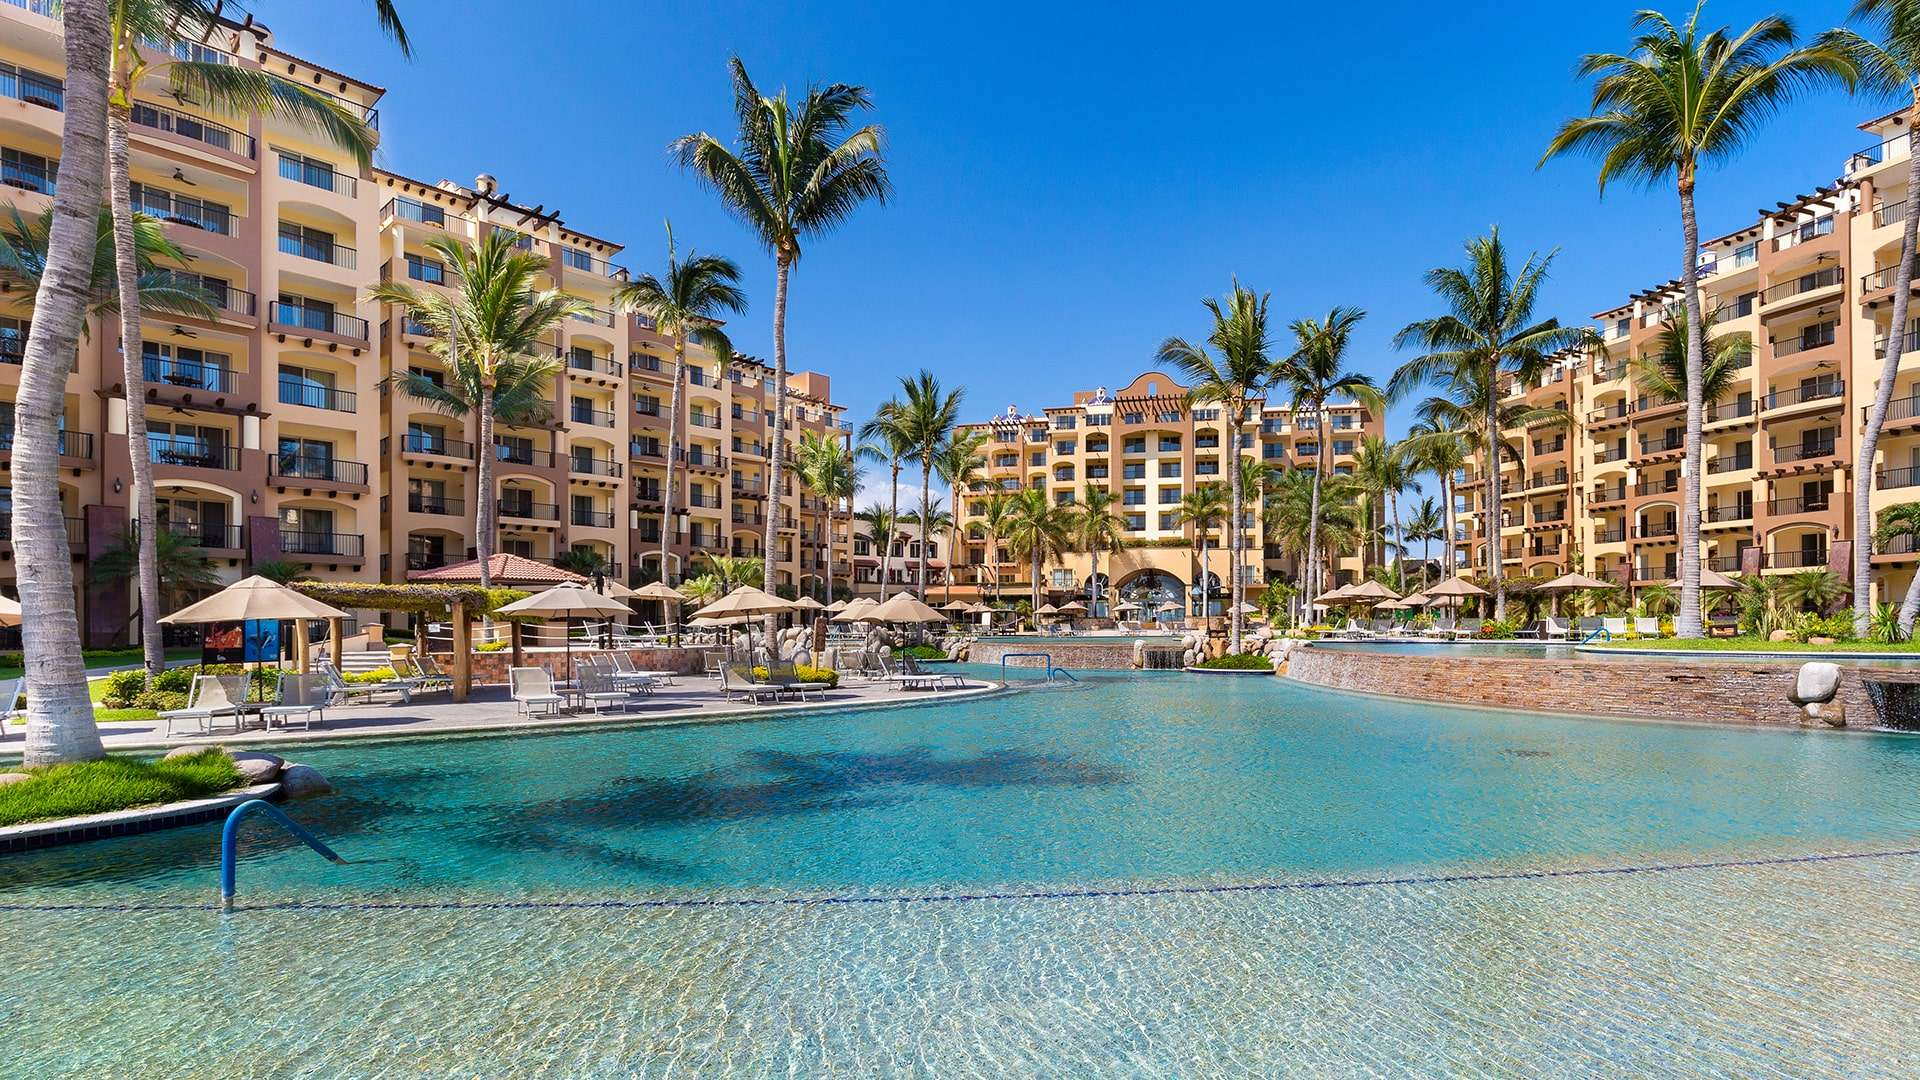 Villa Del Palmar Flamingos Wins Tripadvisor Travellers Choice Awards